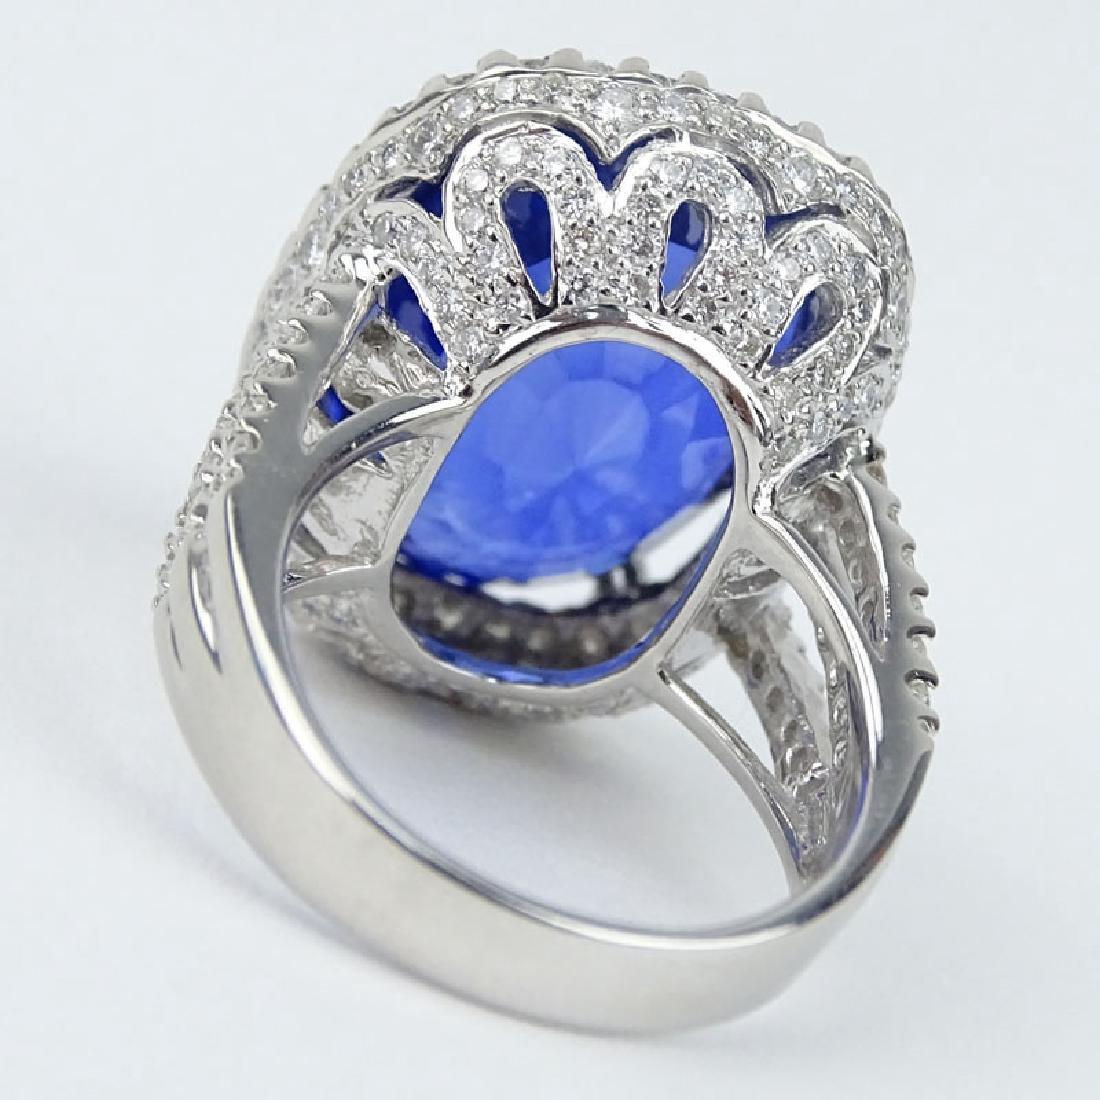 24.14 Carat Oval Cut Royal Blue Sapphire, 2.08 Carat - 2